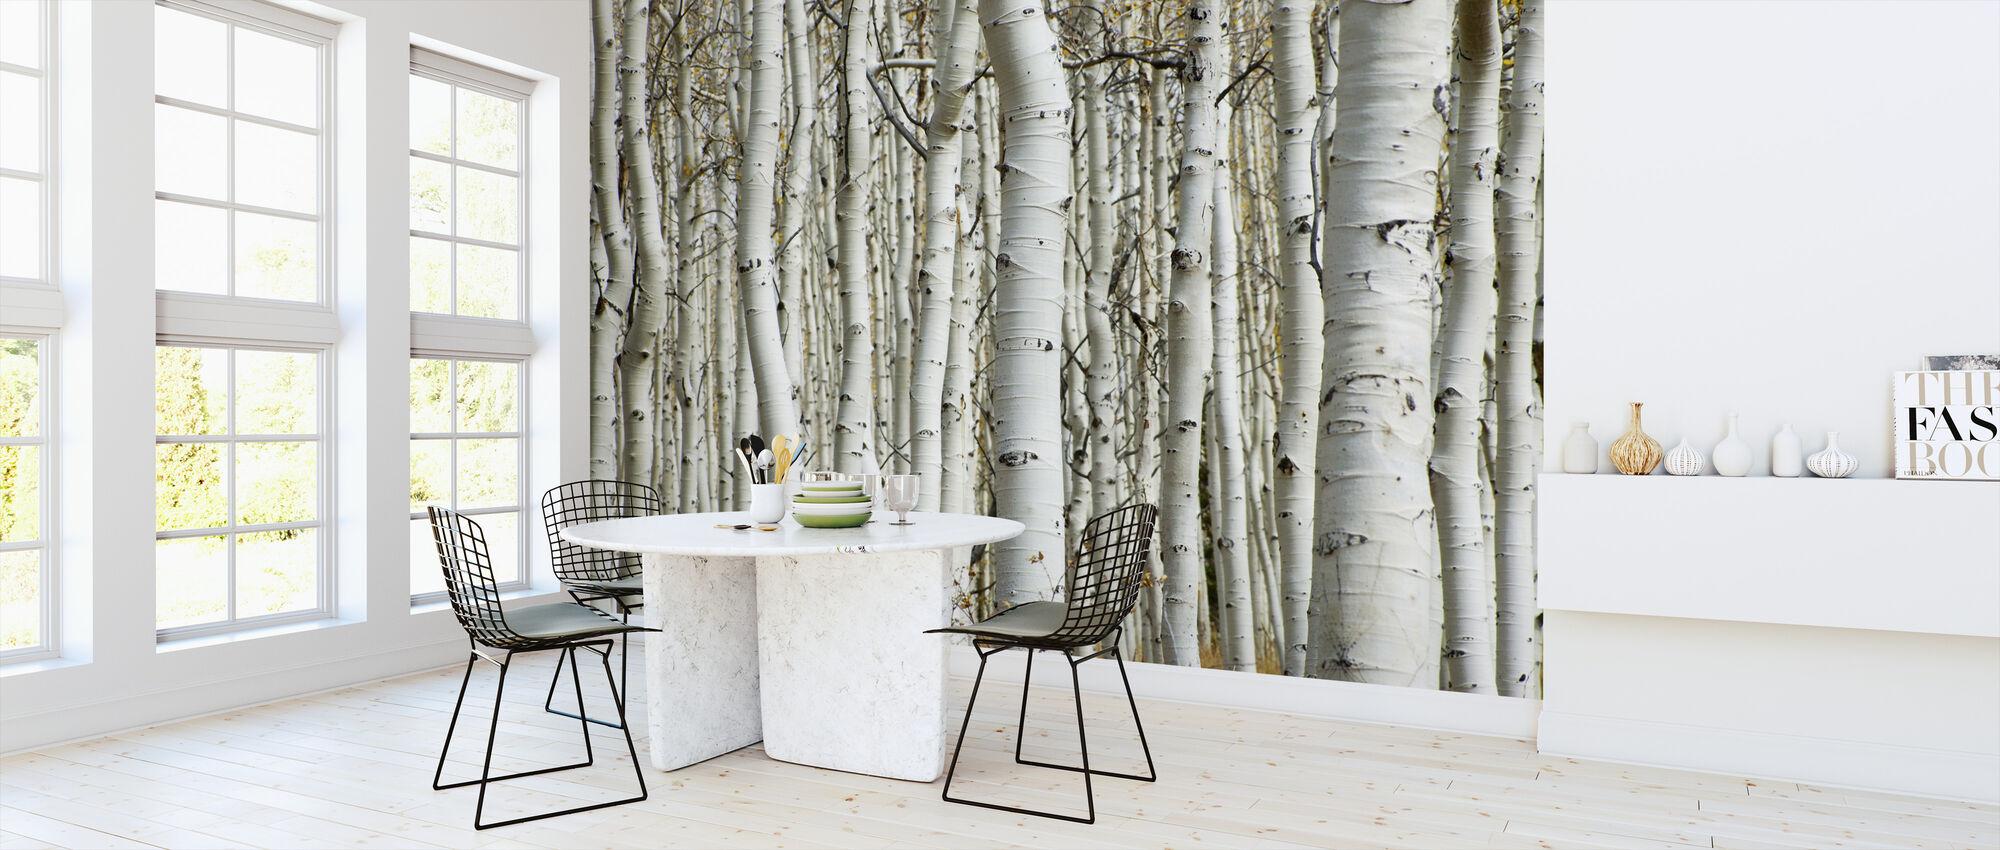 Aspen Forest - Wallpaper - Kitchen